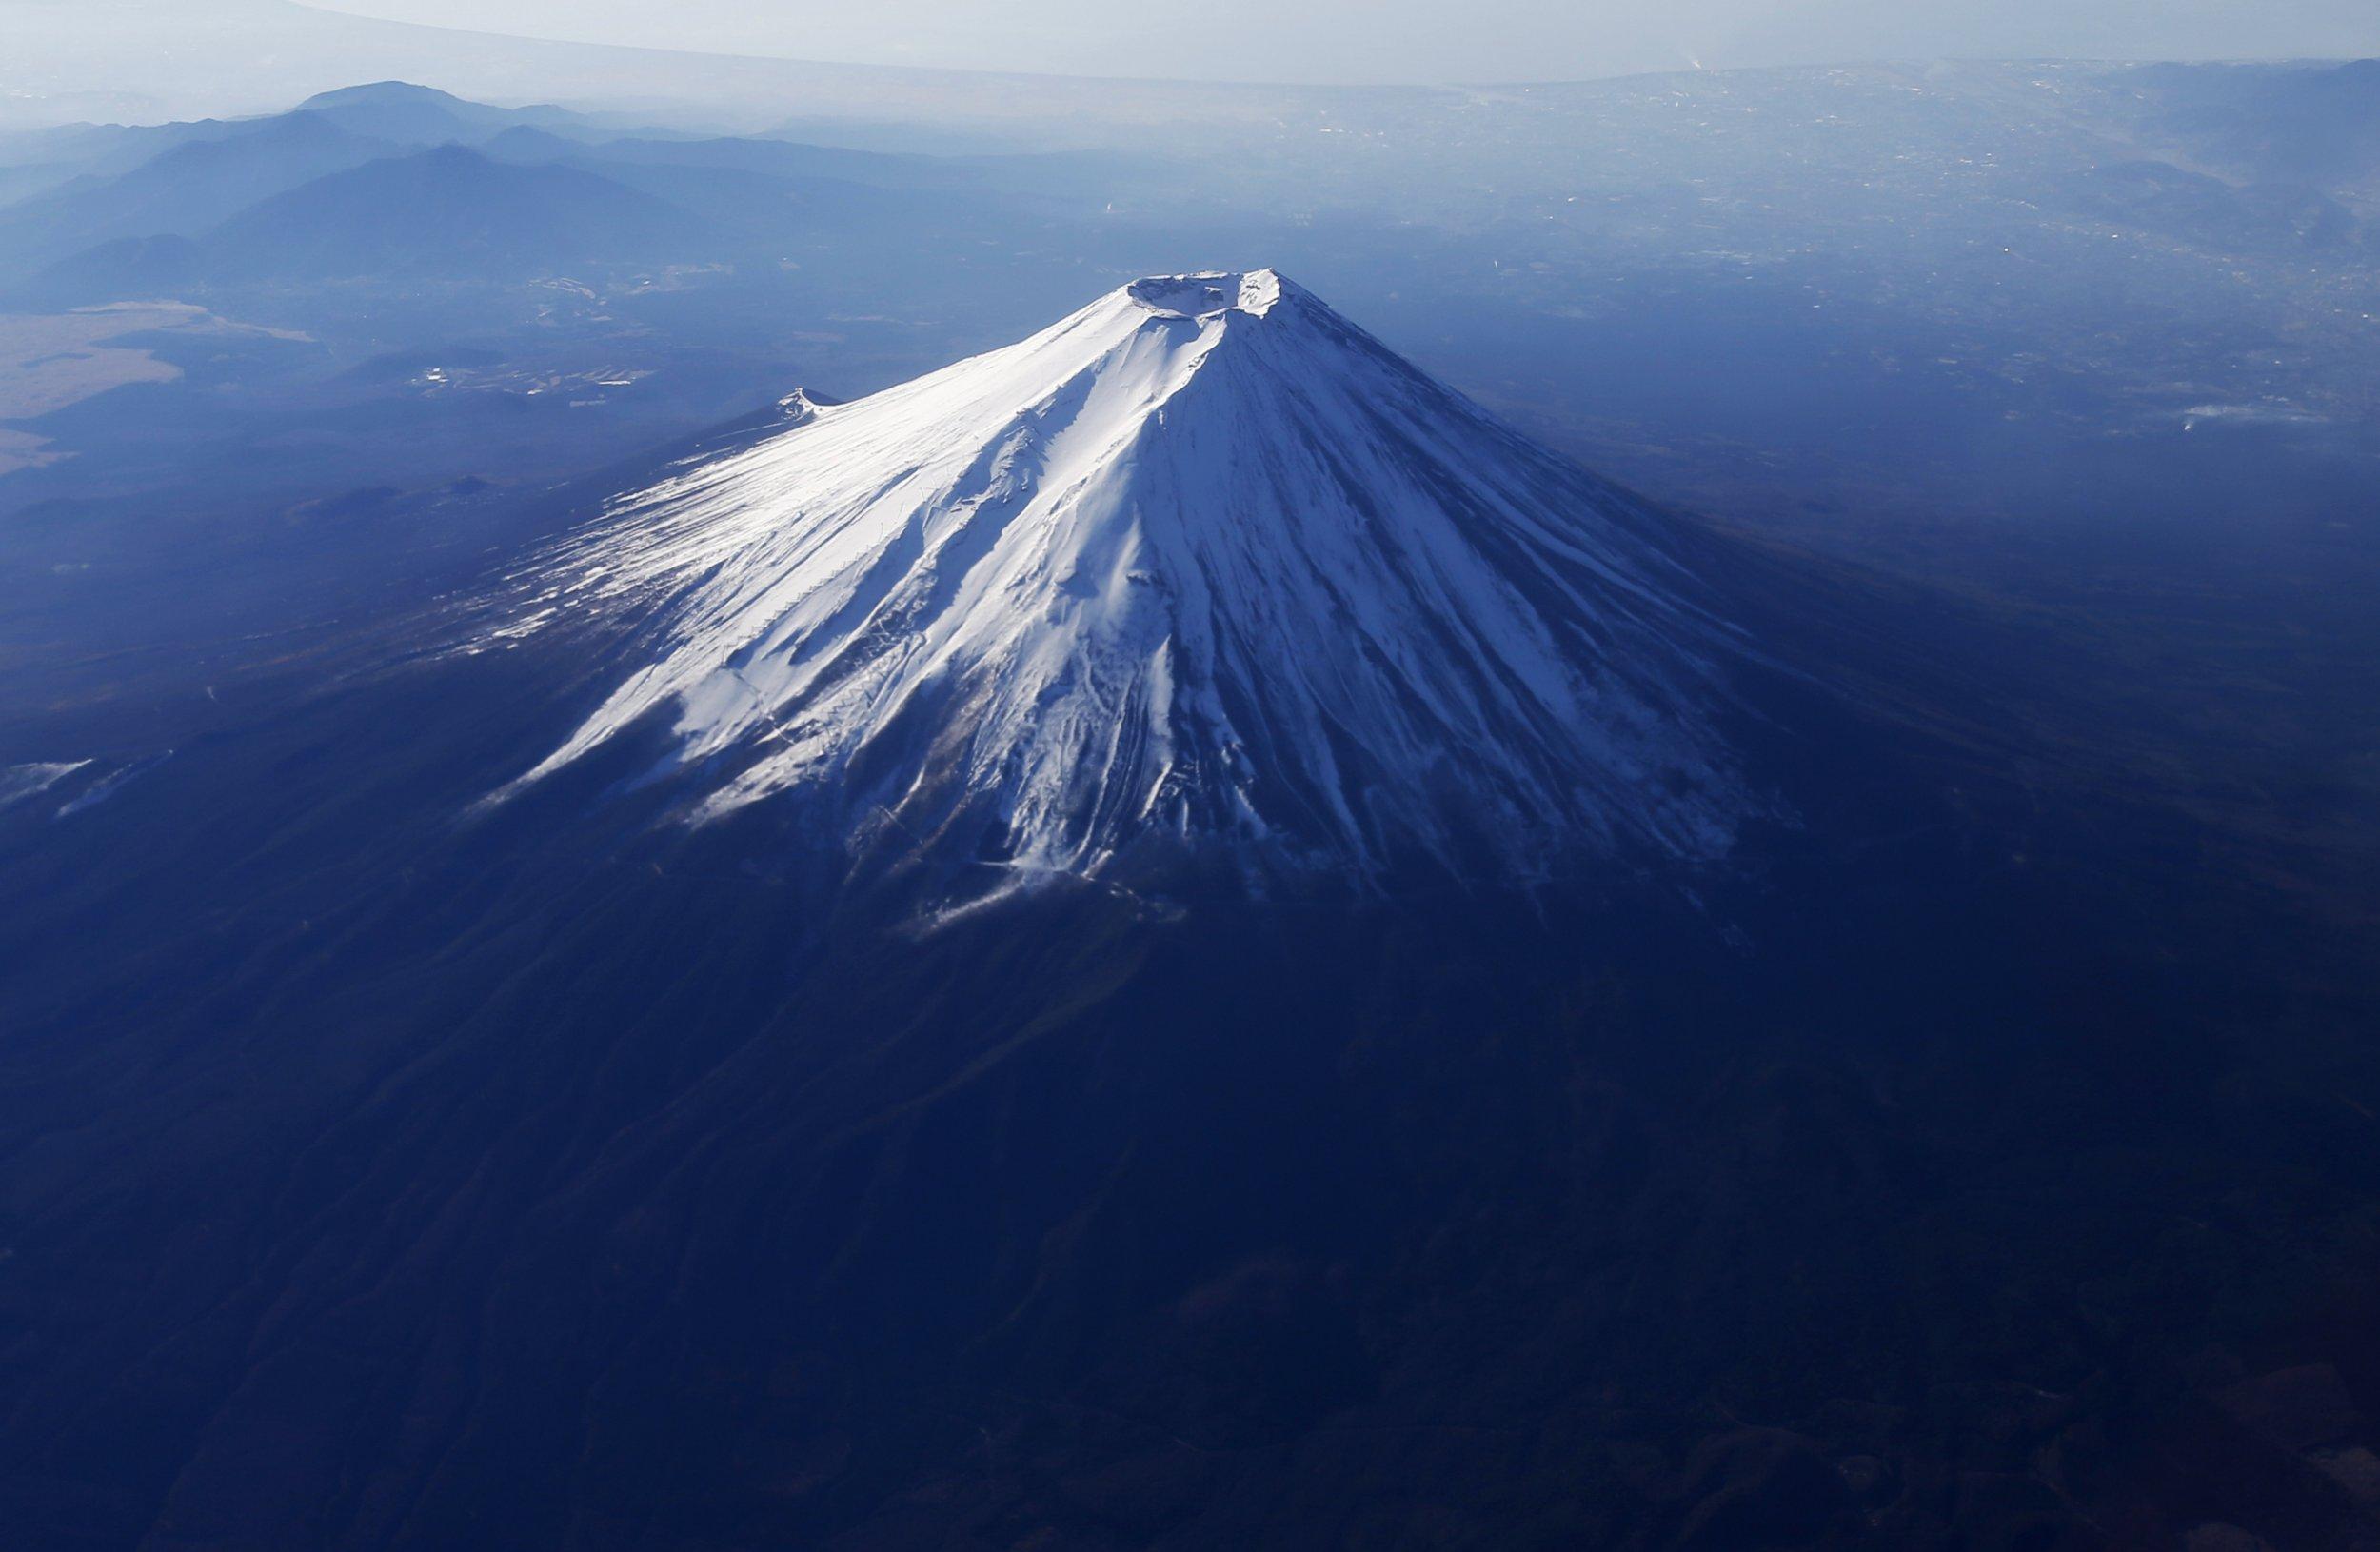 10 of the worlds most active volcanoes pics  Matador